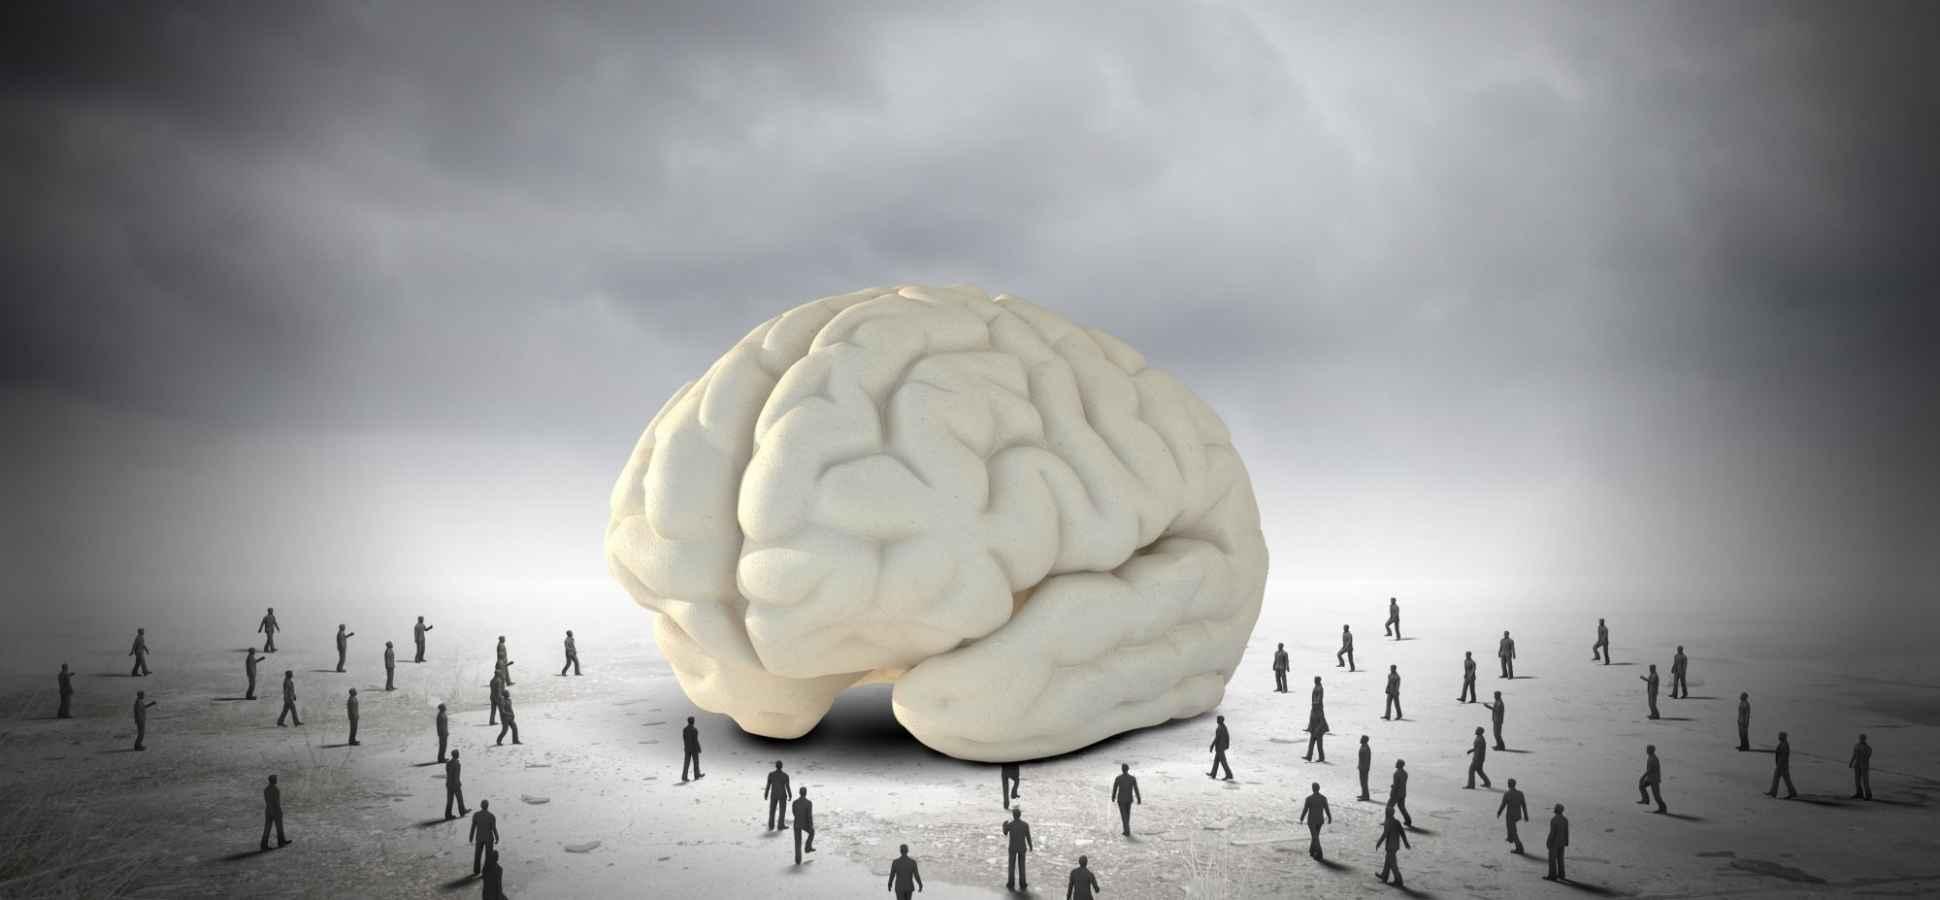 نتيجة بحث الصور عن What happens to your brain and body when you procrastinate too much